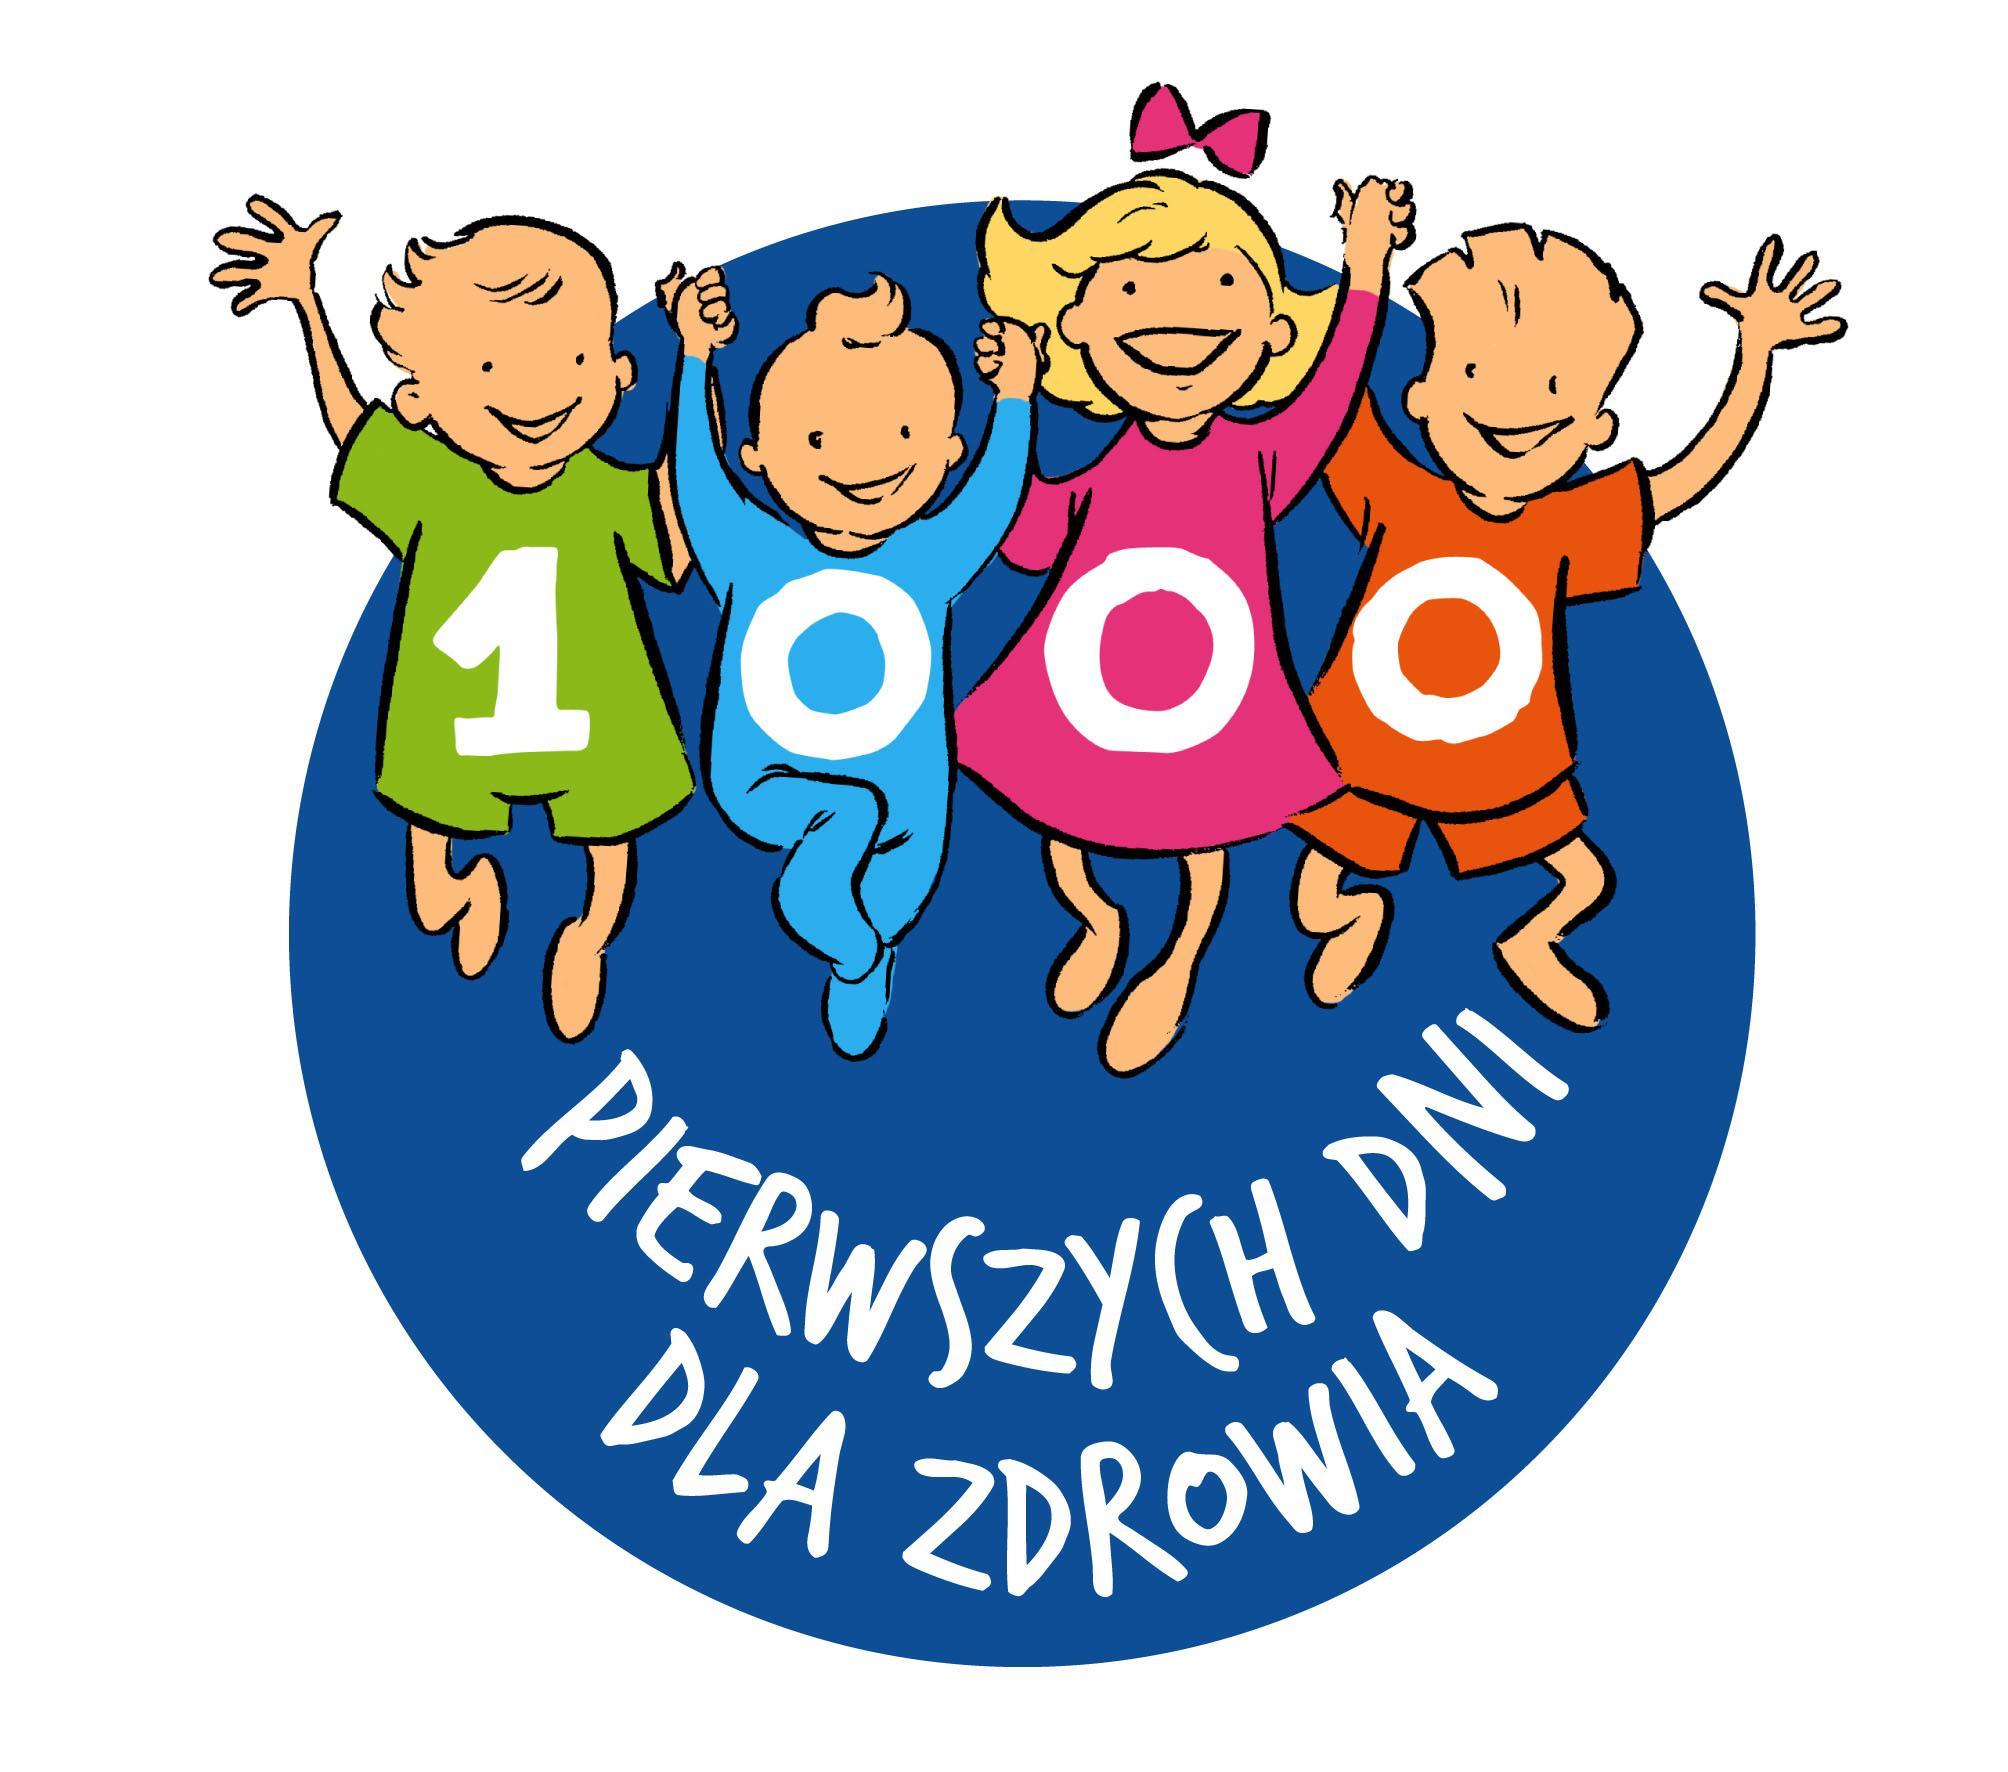 1000dni-logotyp.jpg